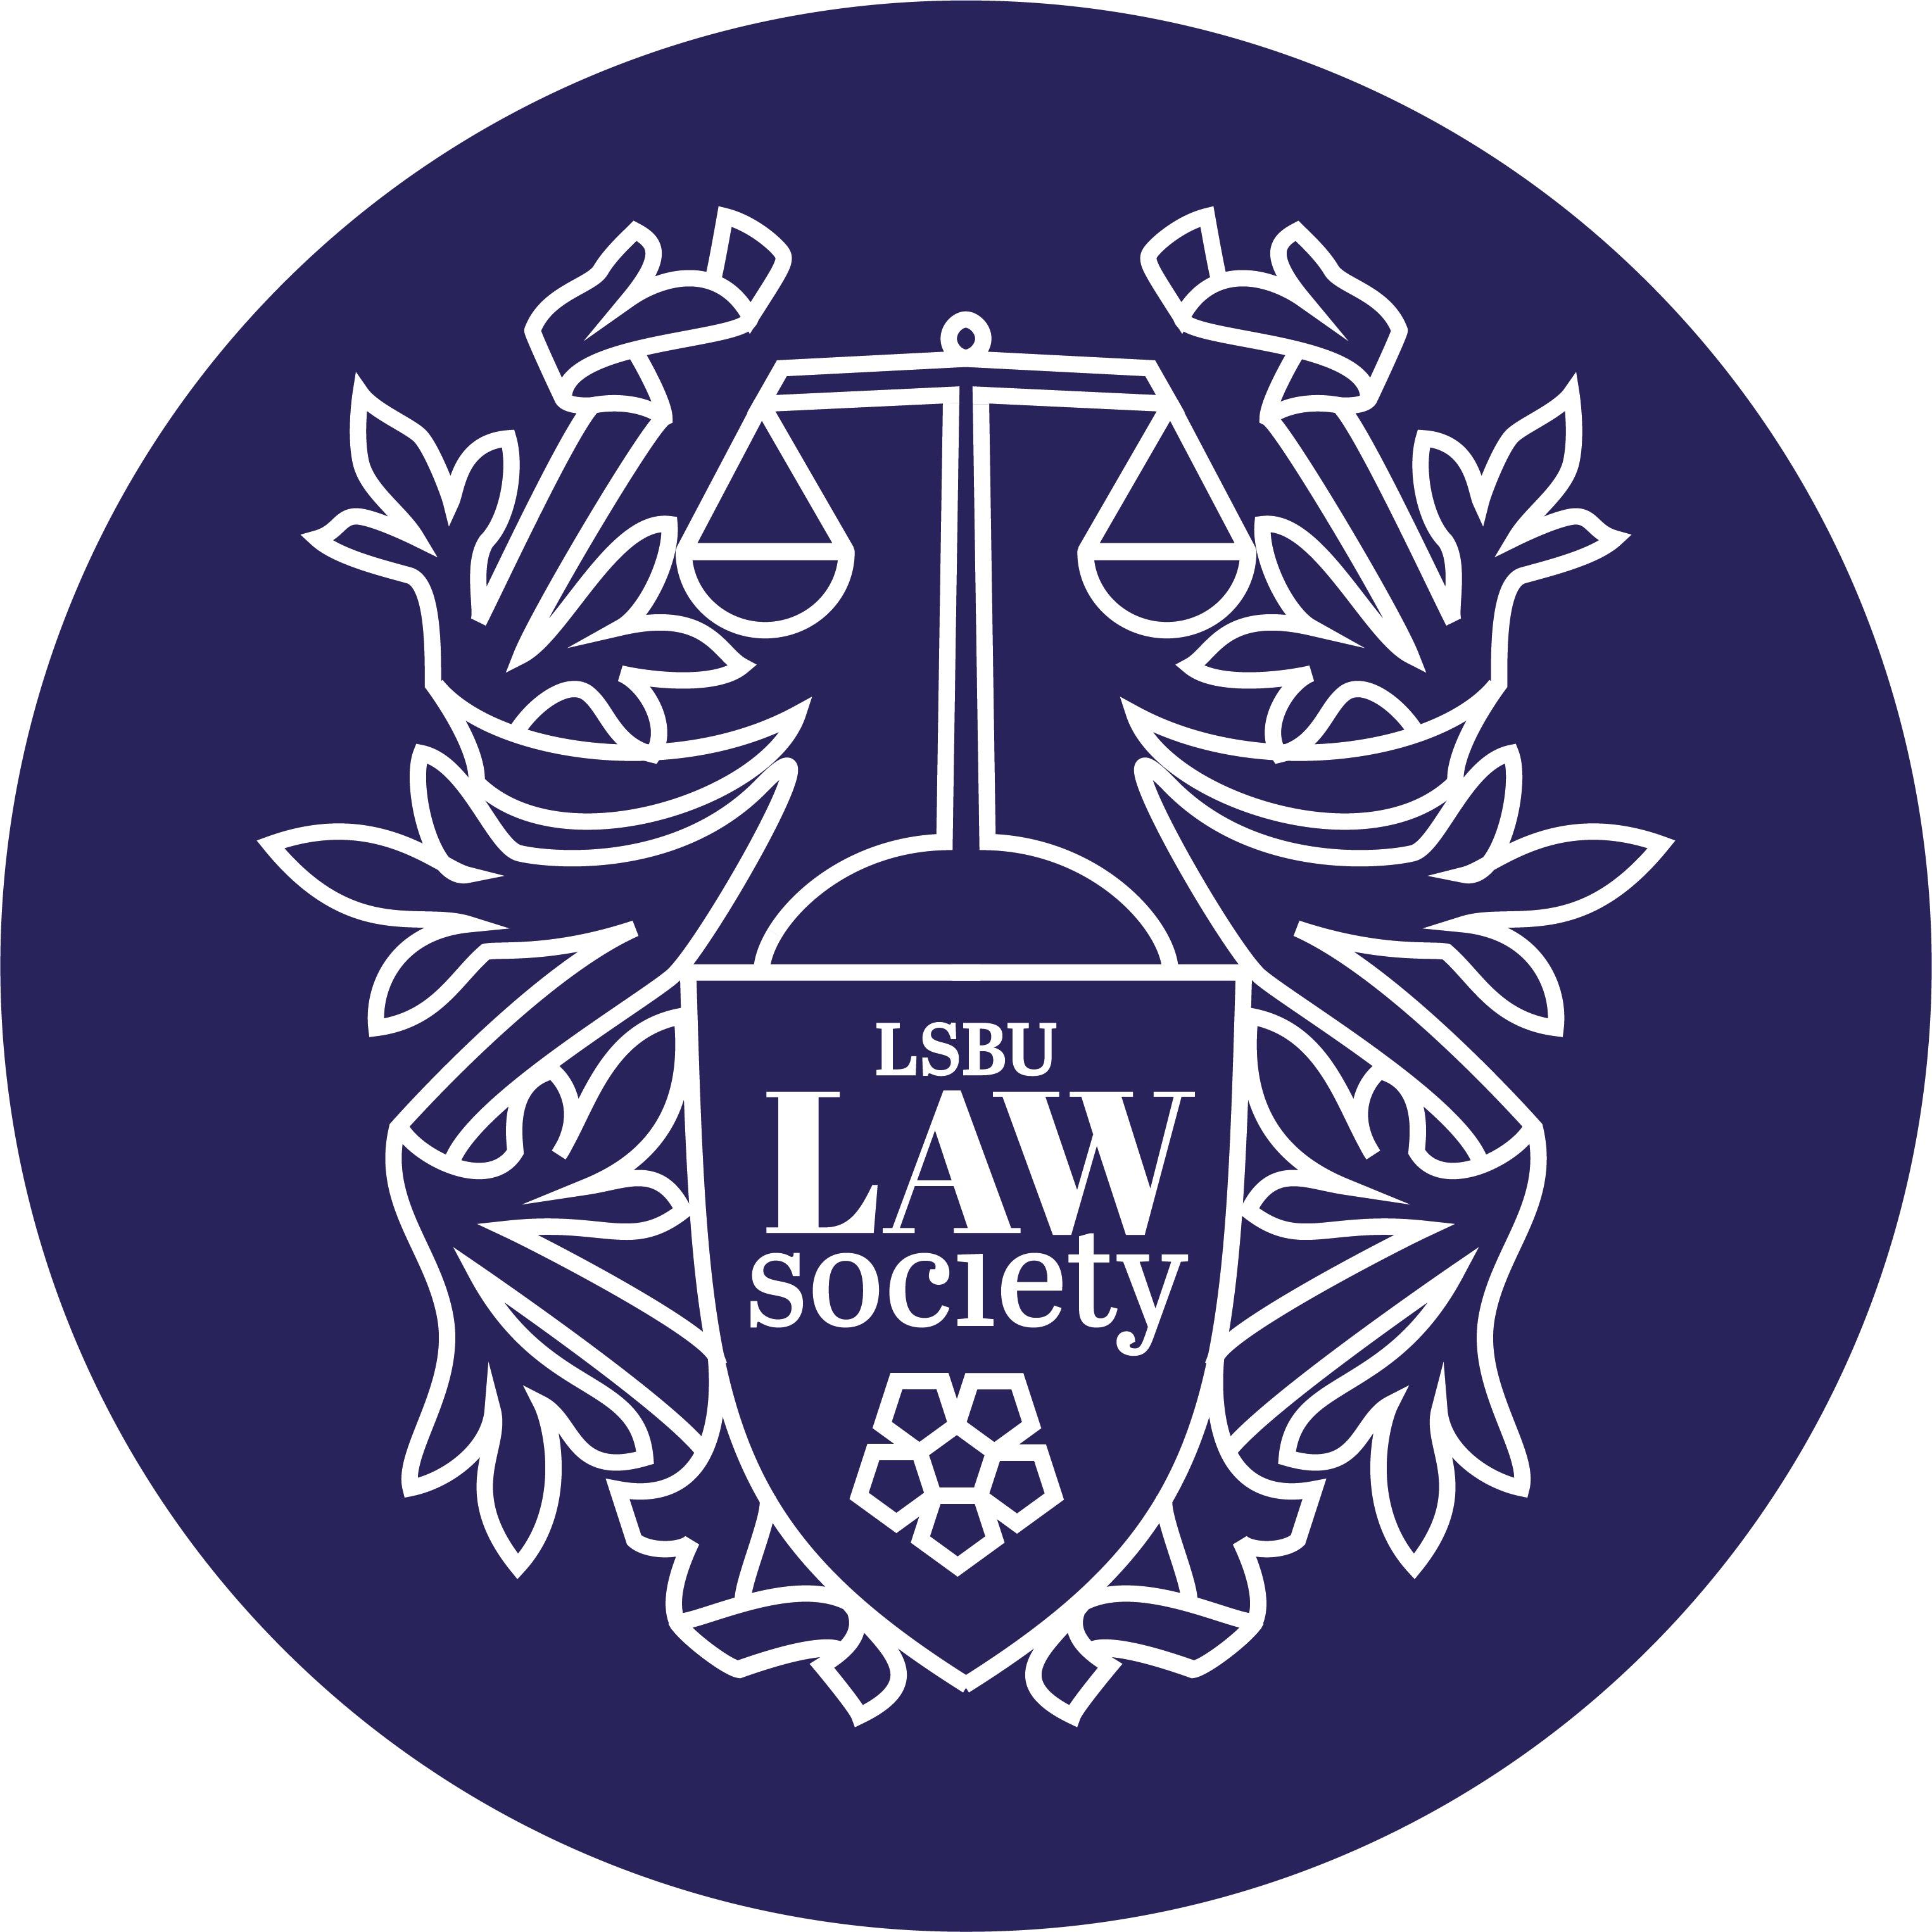 London South Bank University Law Society